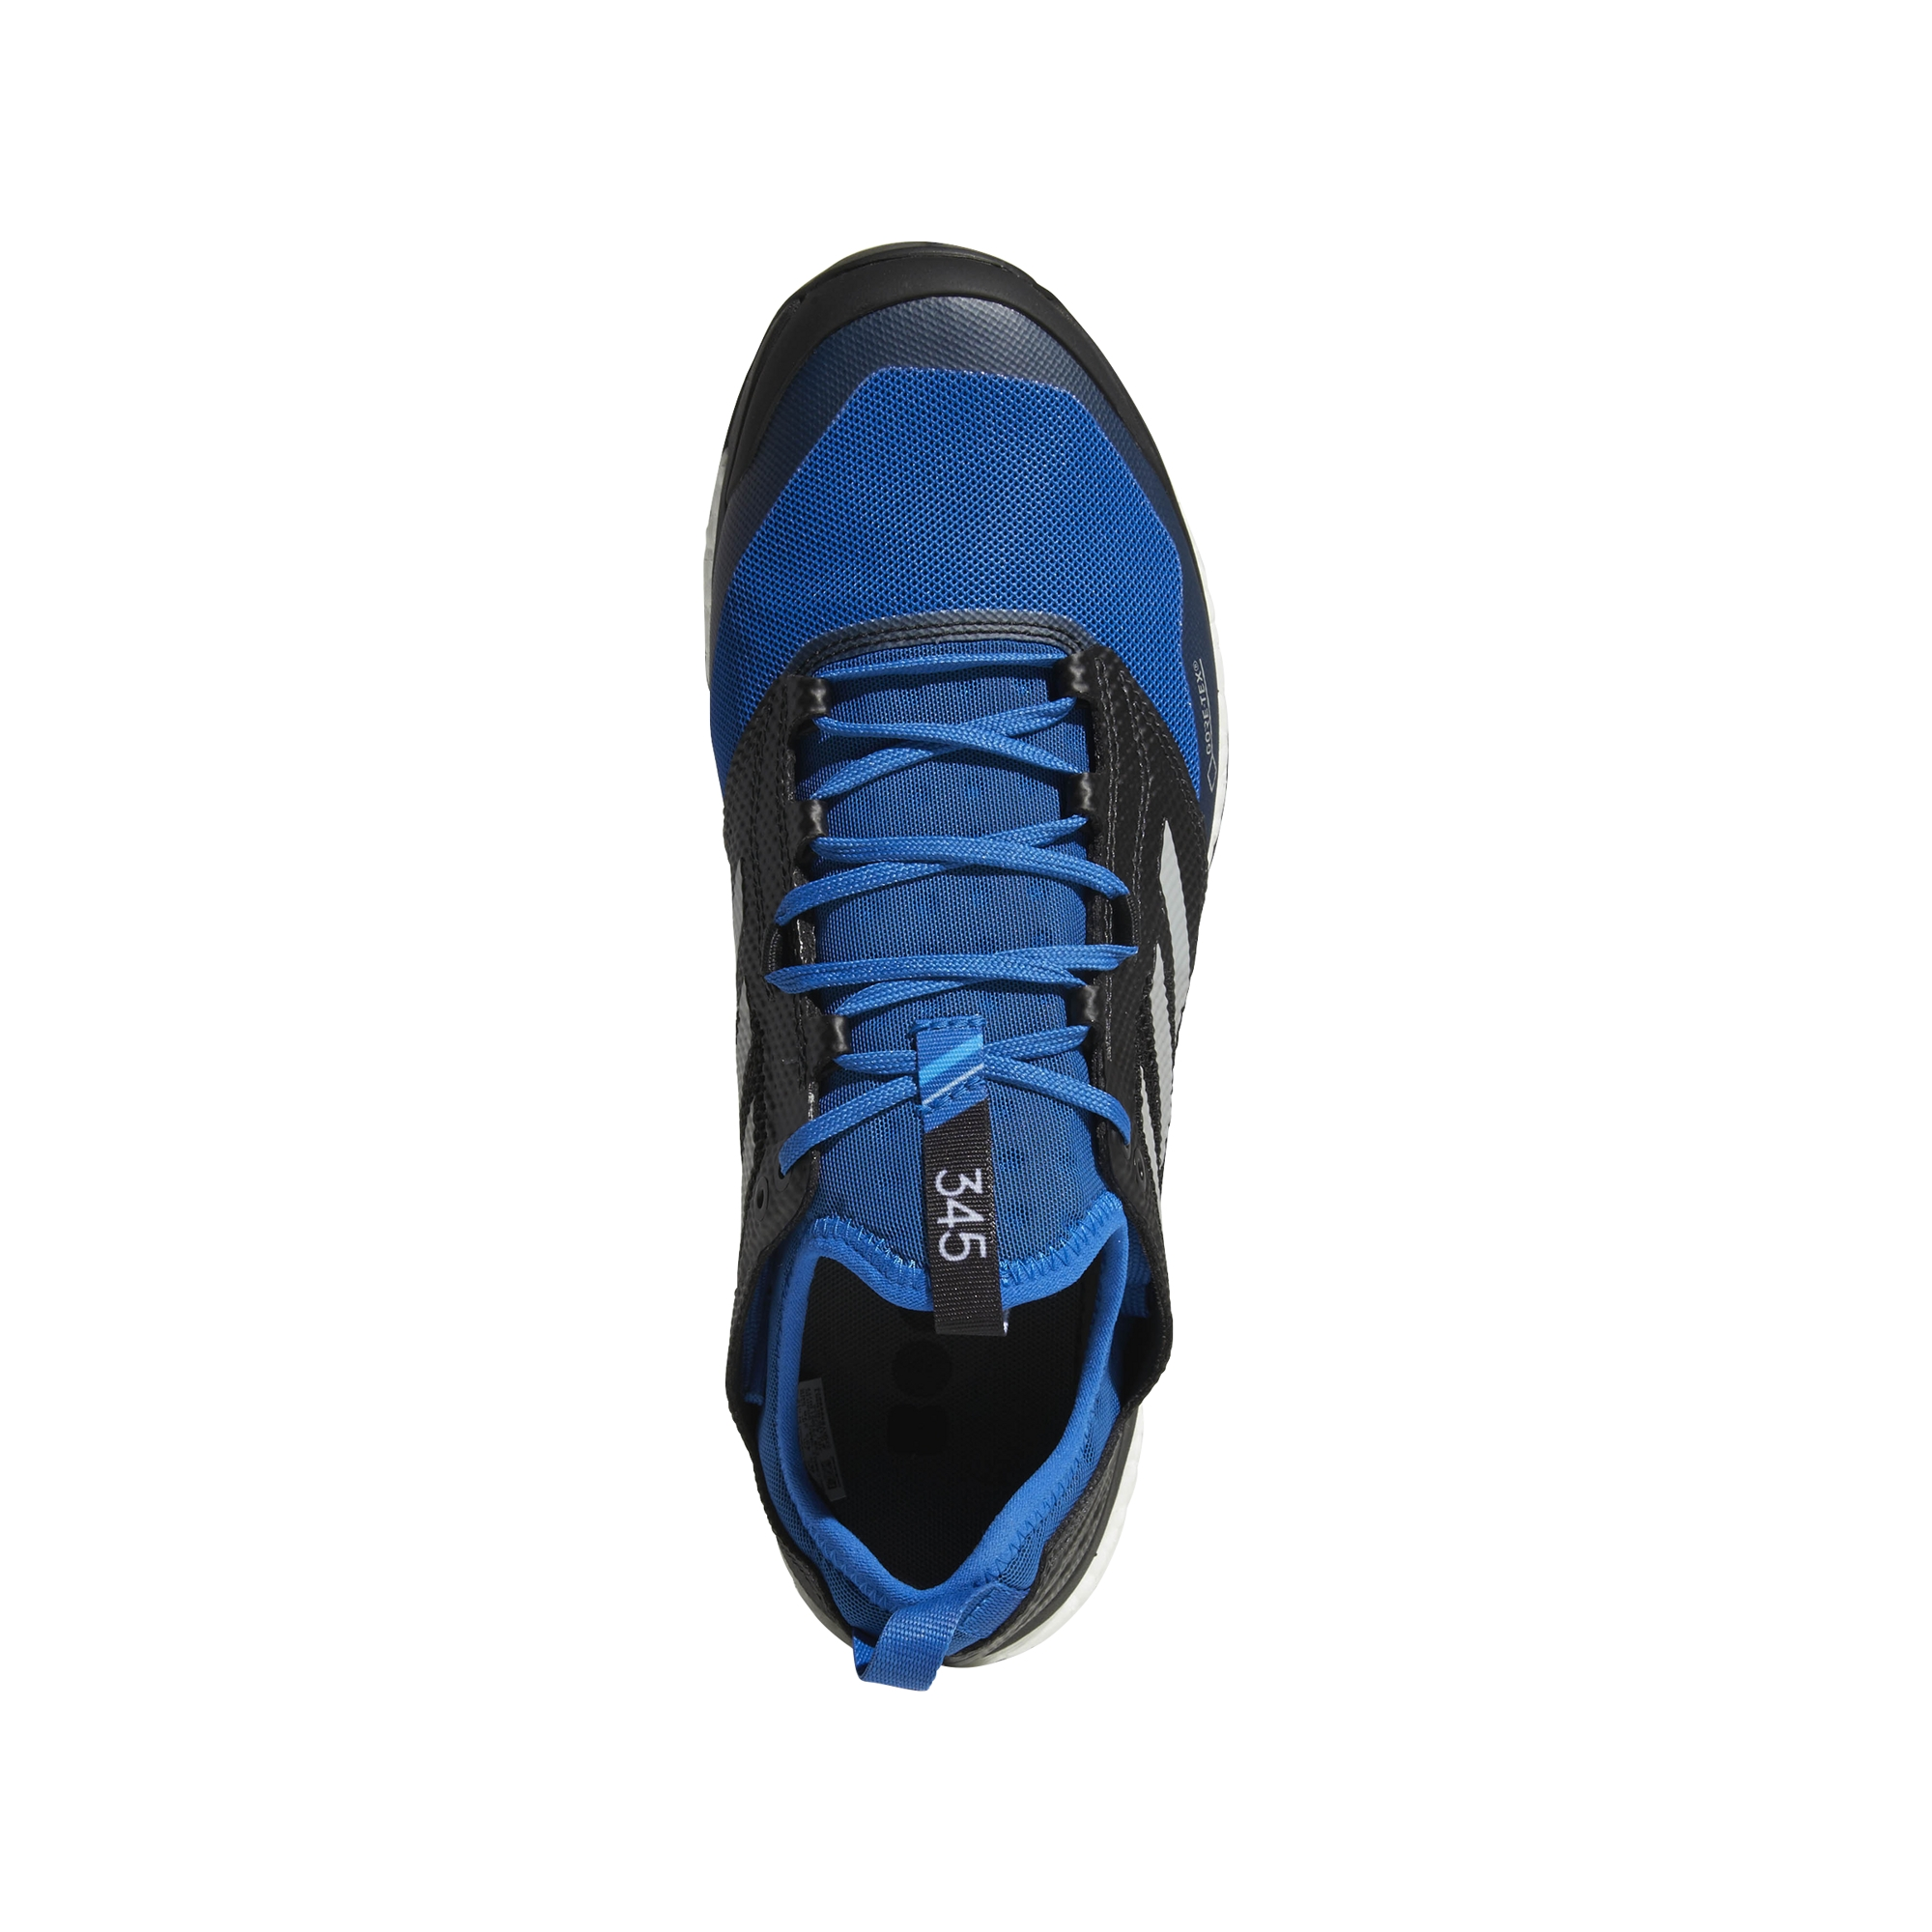 Chaussures adidas Terrex Agravic XT GTX  78c2bb7c0